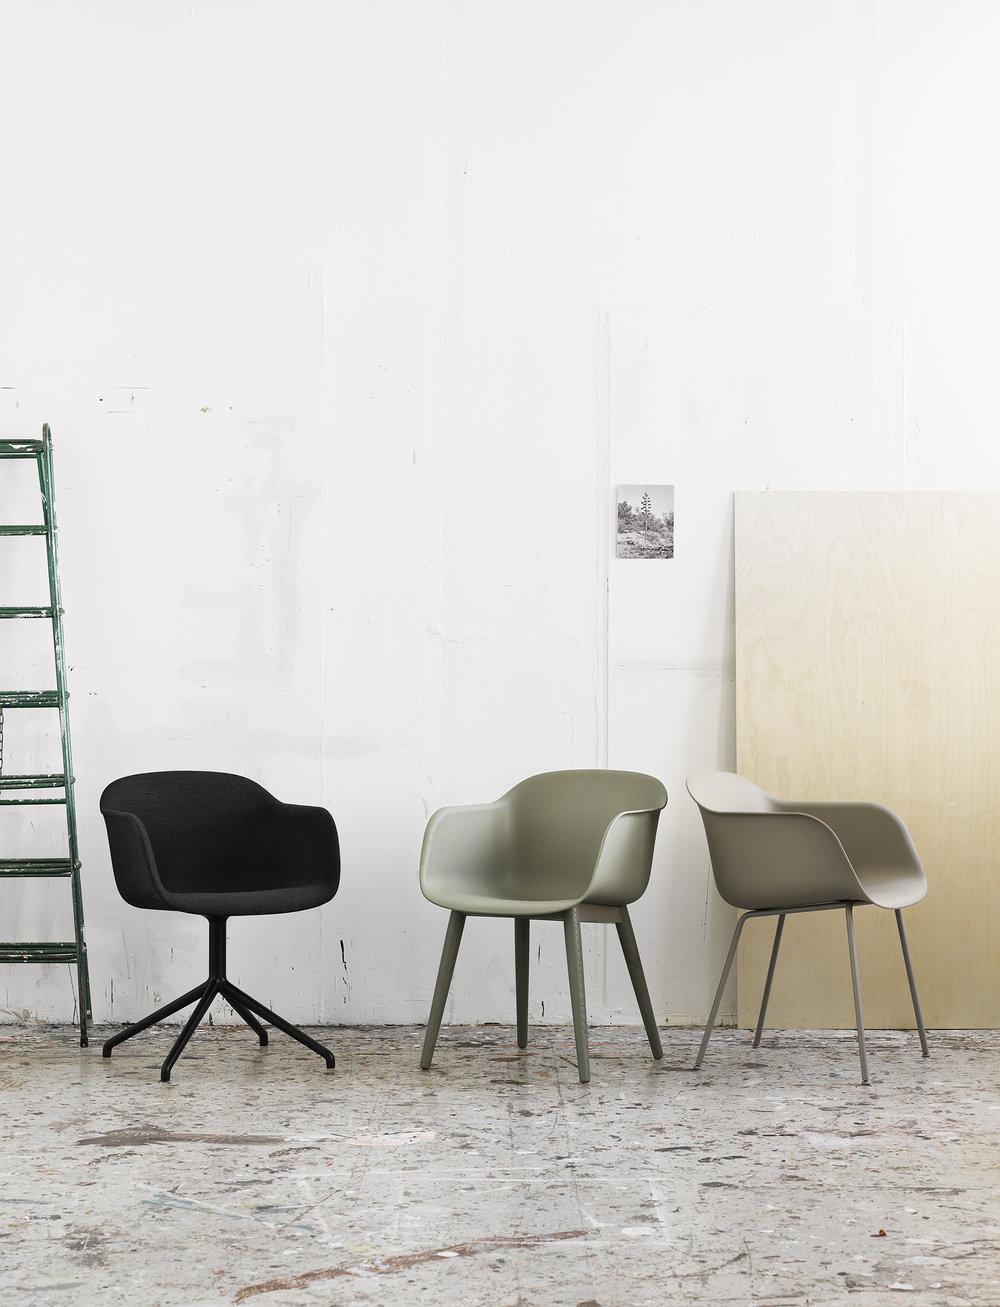 fiber_chair_remix 183_dusty green_grey.jpg